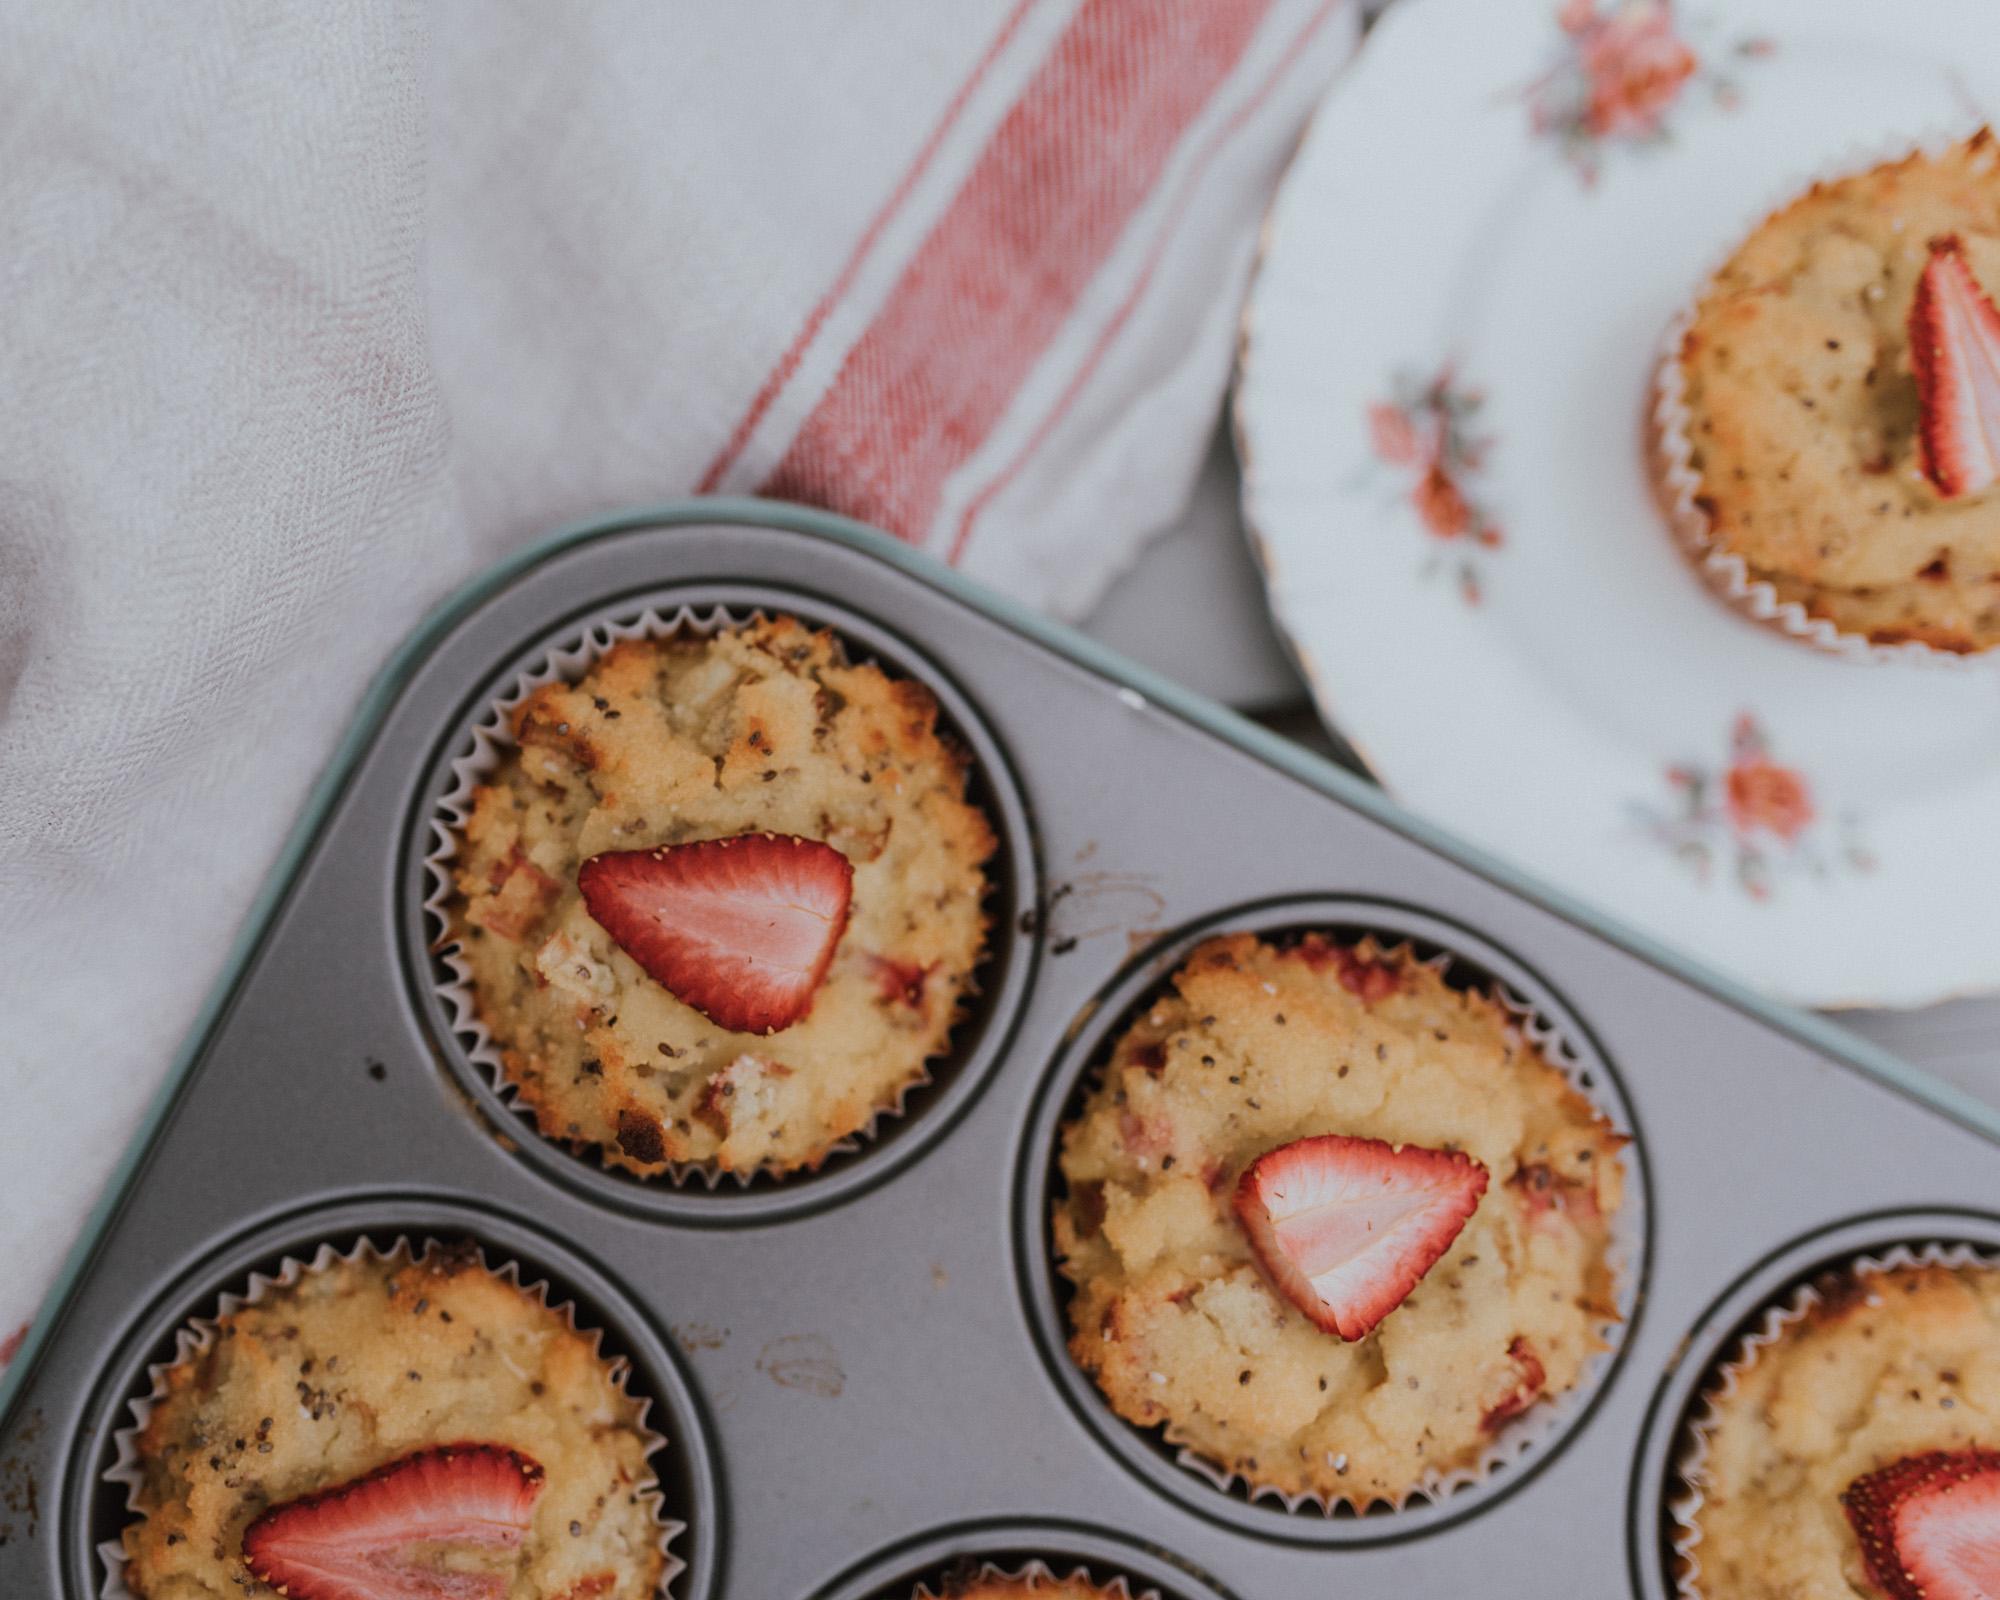 The Wild Decoelis | Paleo Strawberry Rhubarb Chia Muffins, gluten-free, grain-free, sugar-free, Dairy-free